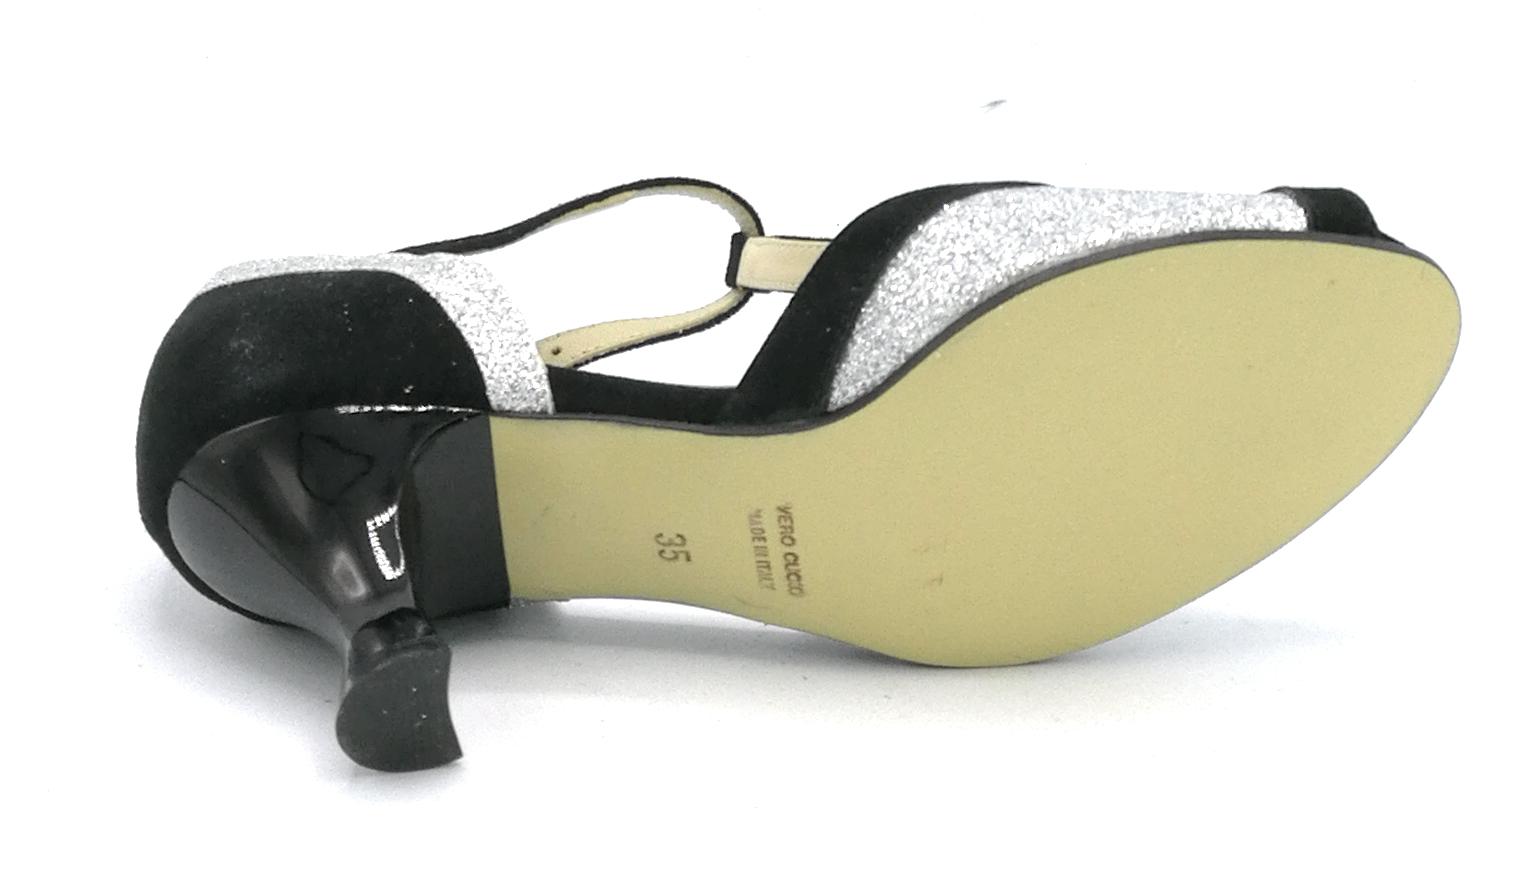 S2020 Shoebiz Scarpe Da Glitter Ballo Argento Nero Camoscio uFcTK3Jl1